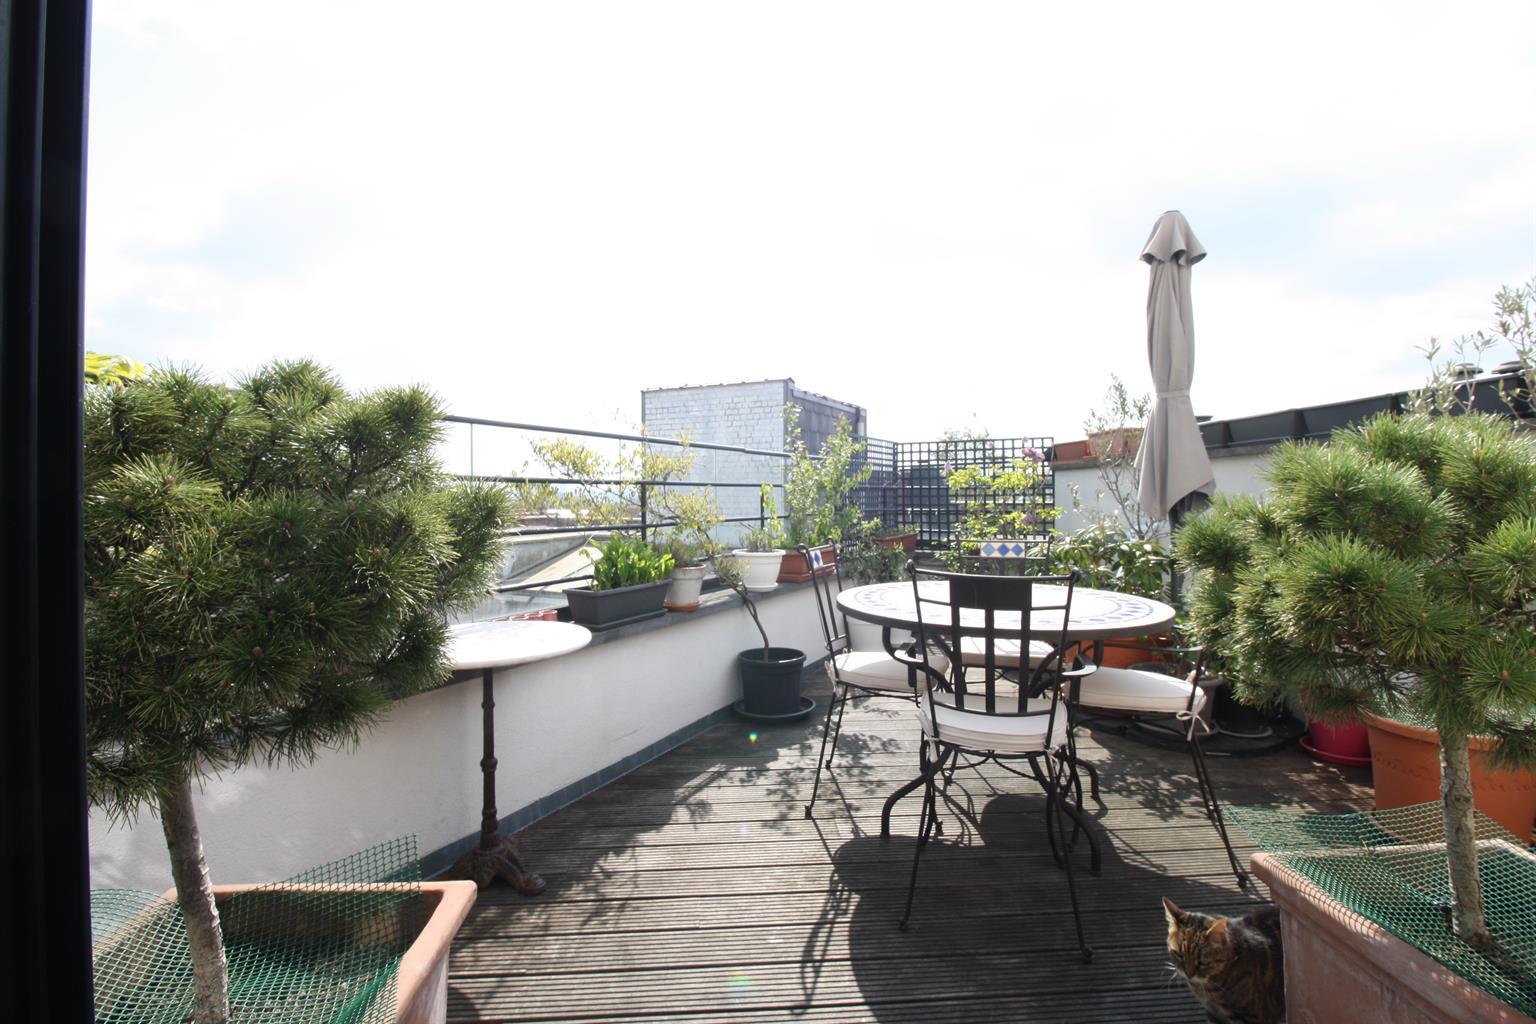 Penthouse - Berchem-Sainte-Agathe - #4346071-17